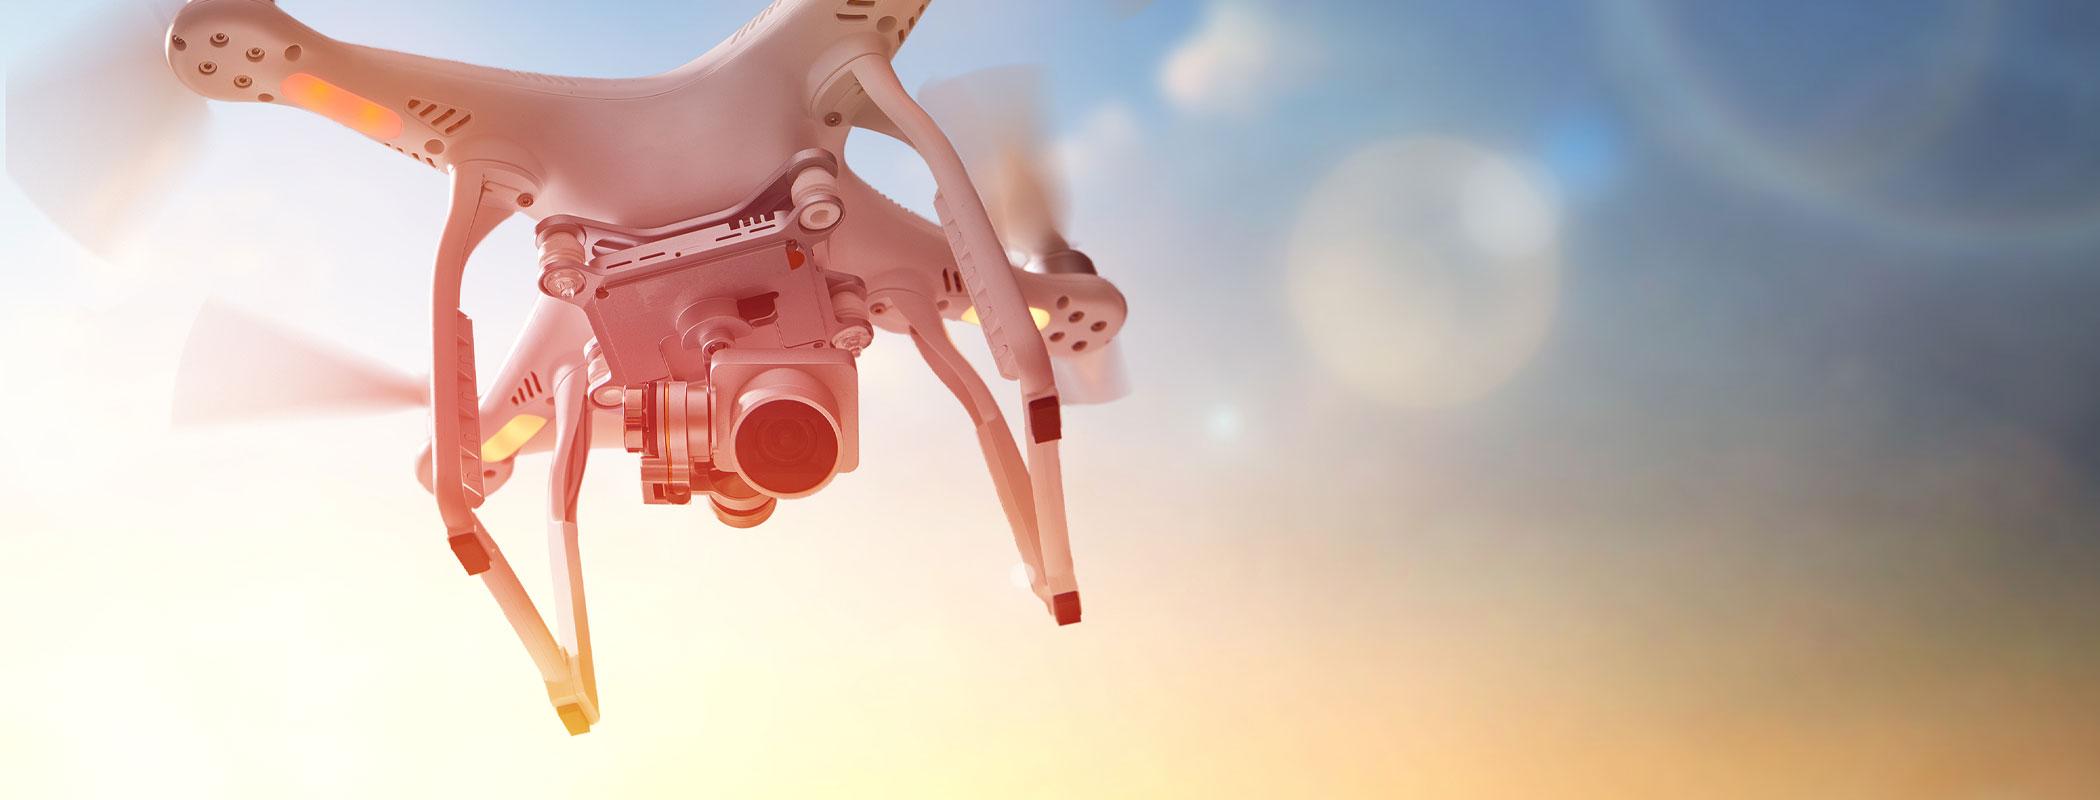 Drohnen-Aufnahmen